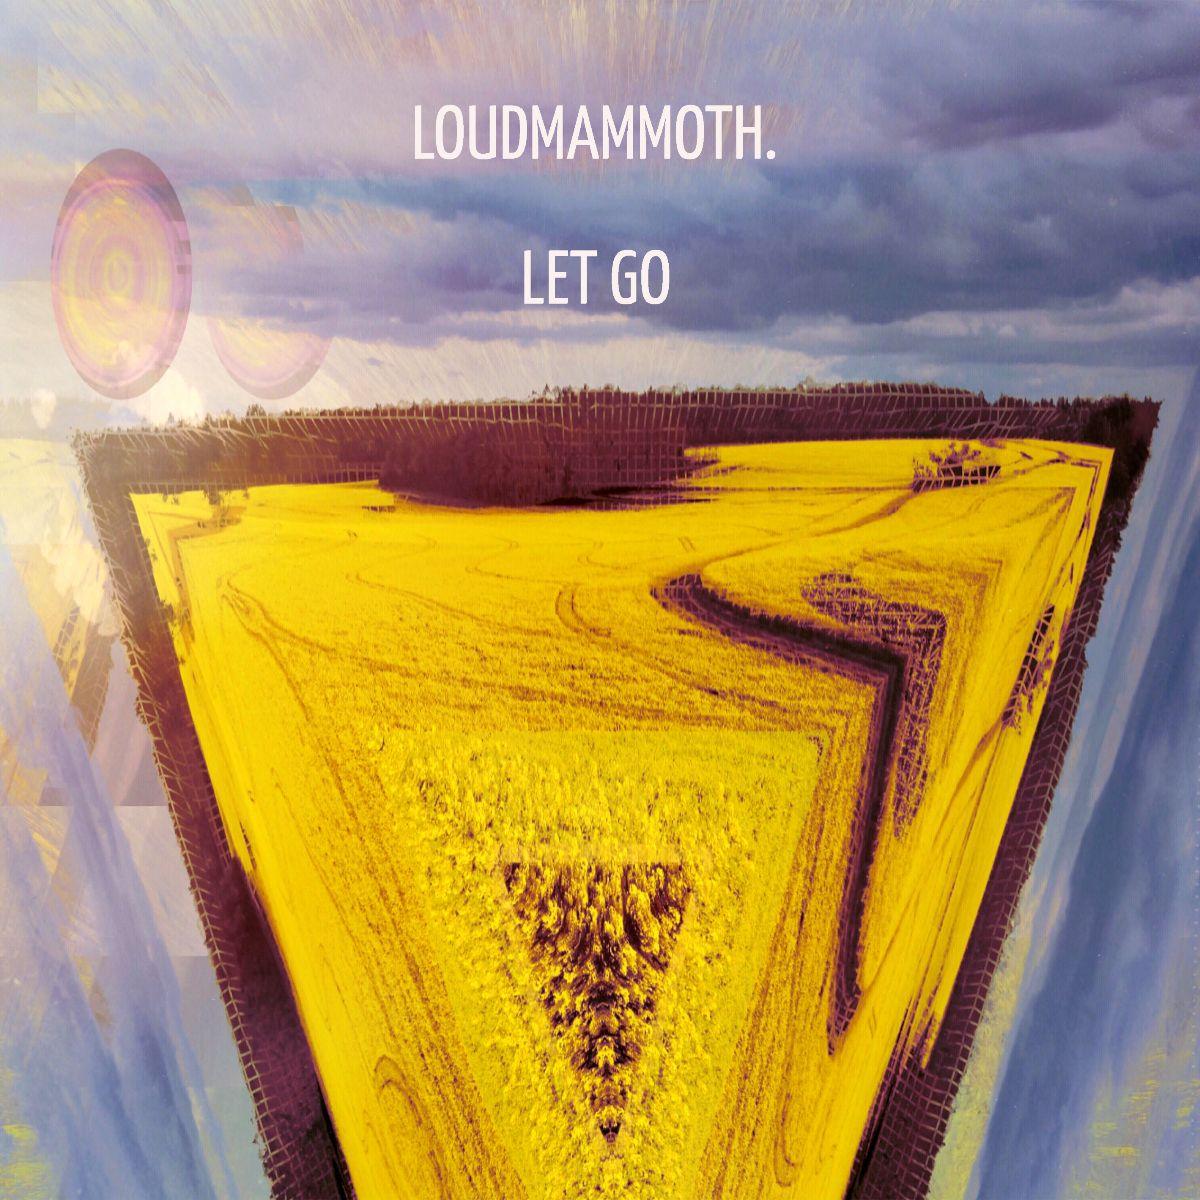 Loudmammoth. Let Go